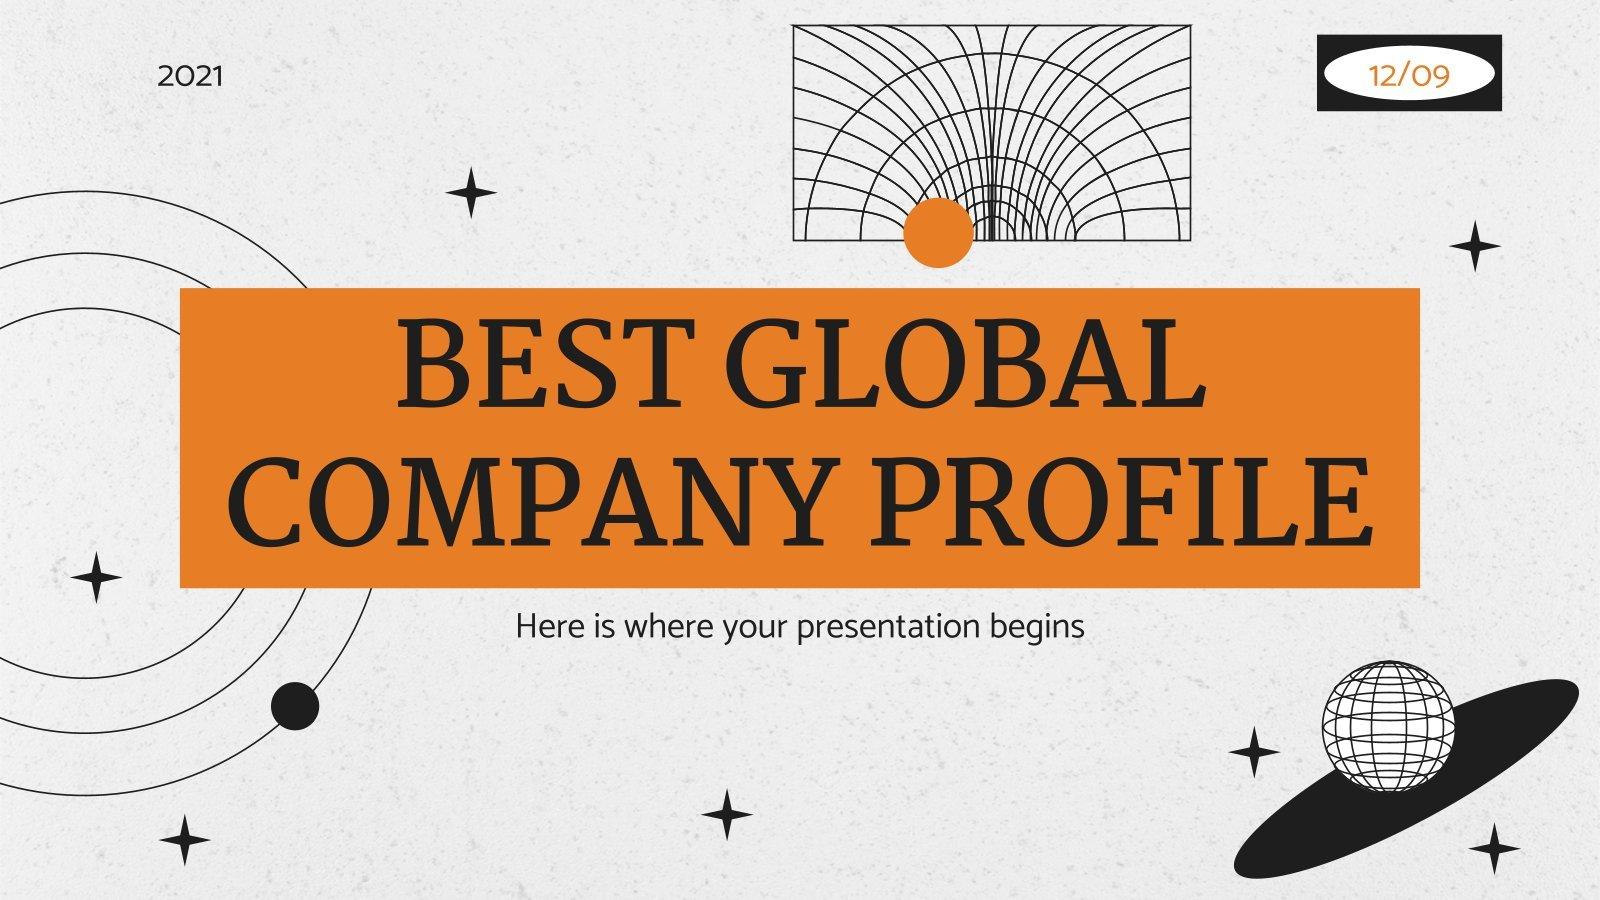 Best Global Company Profile presentation template